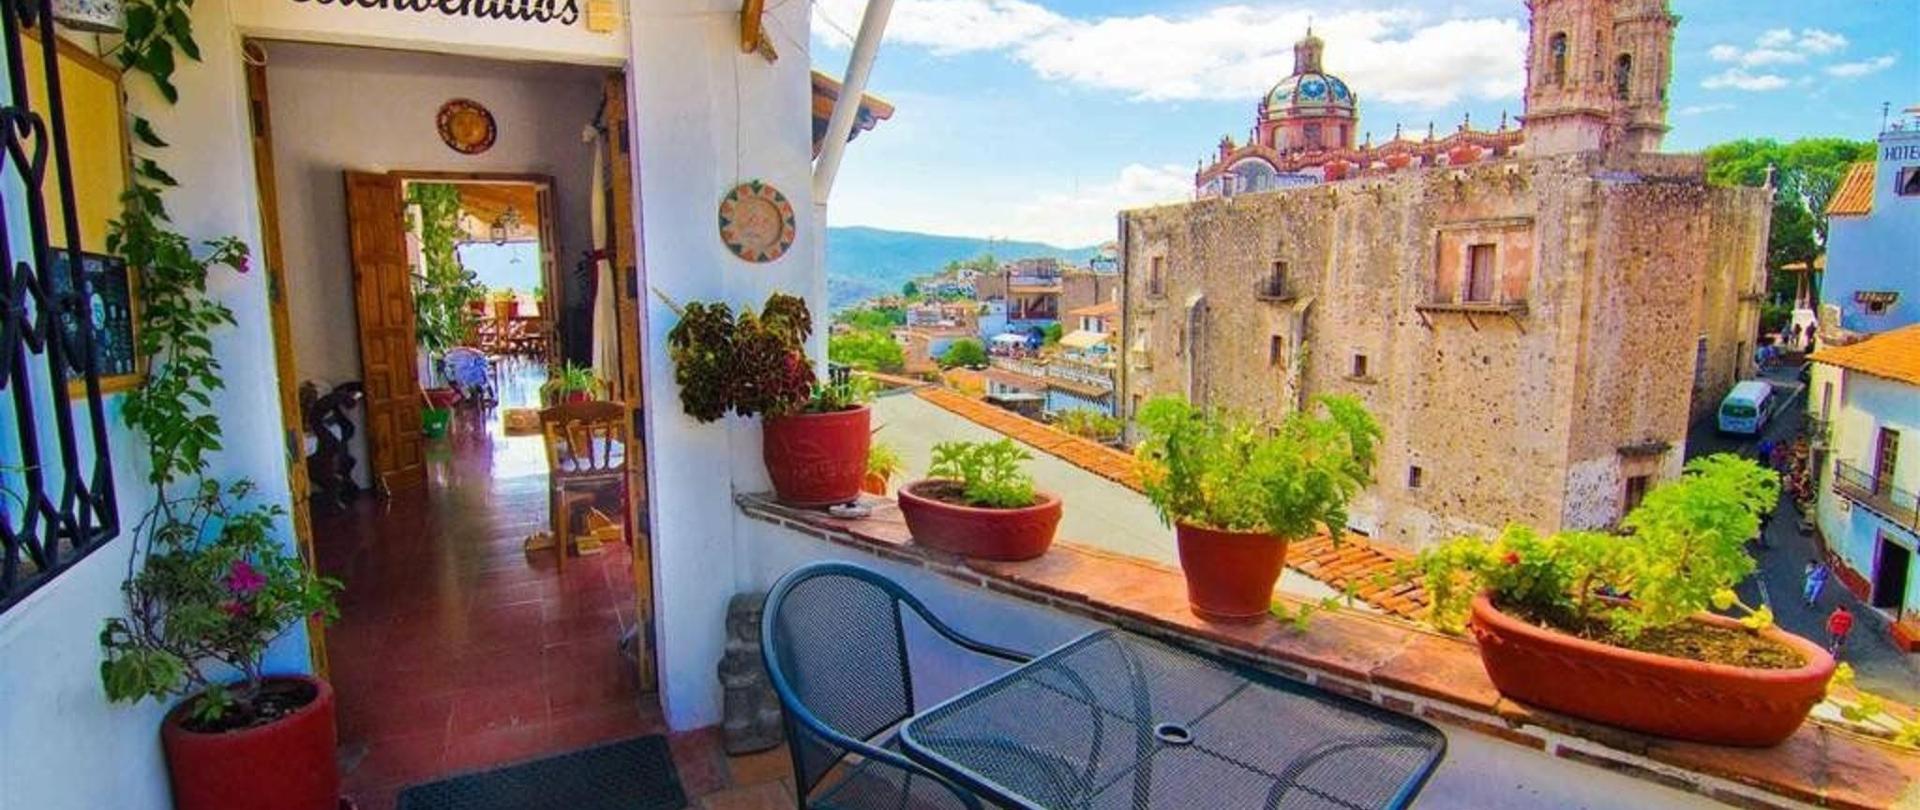 Welcome to Hotel Mi Casita